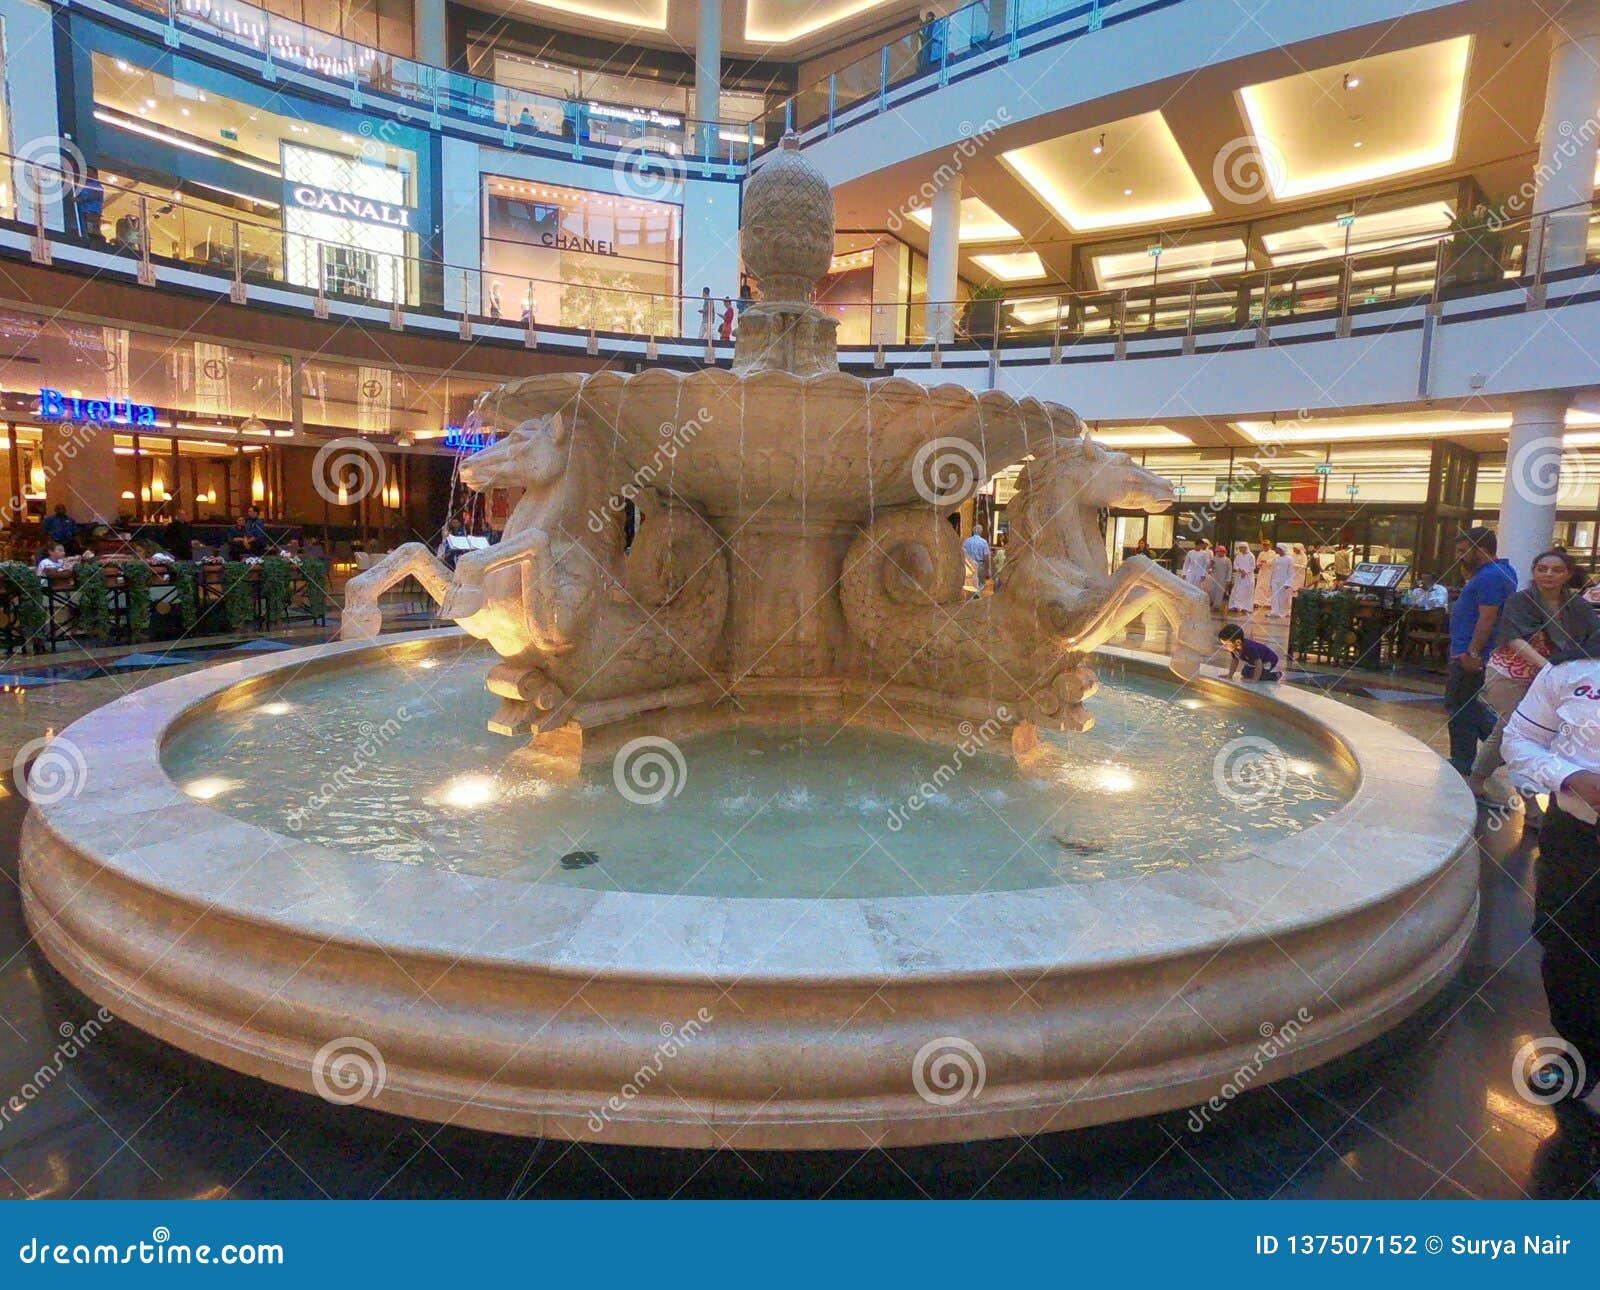 Interior View of People walking around Horses Fountain inside Mall of the Emirates located in Barsha, Dubai, United Arab Emirates